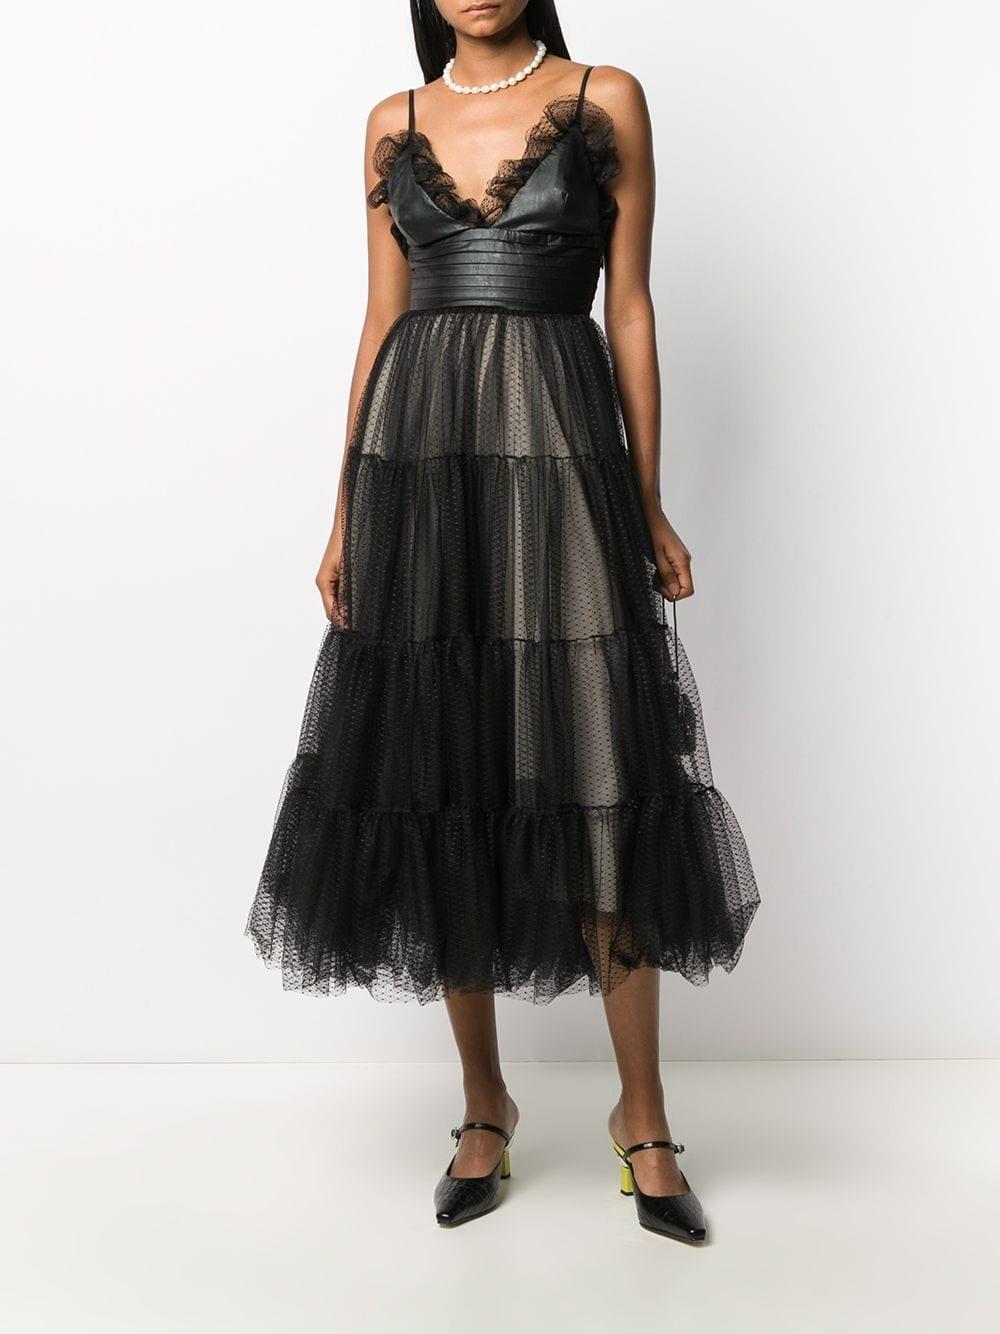 BROGNANO Tulle Tiered Midi Dress